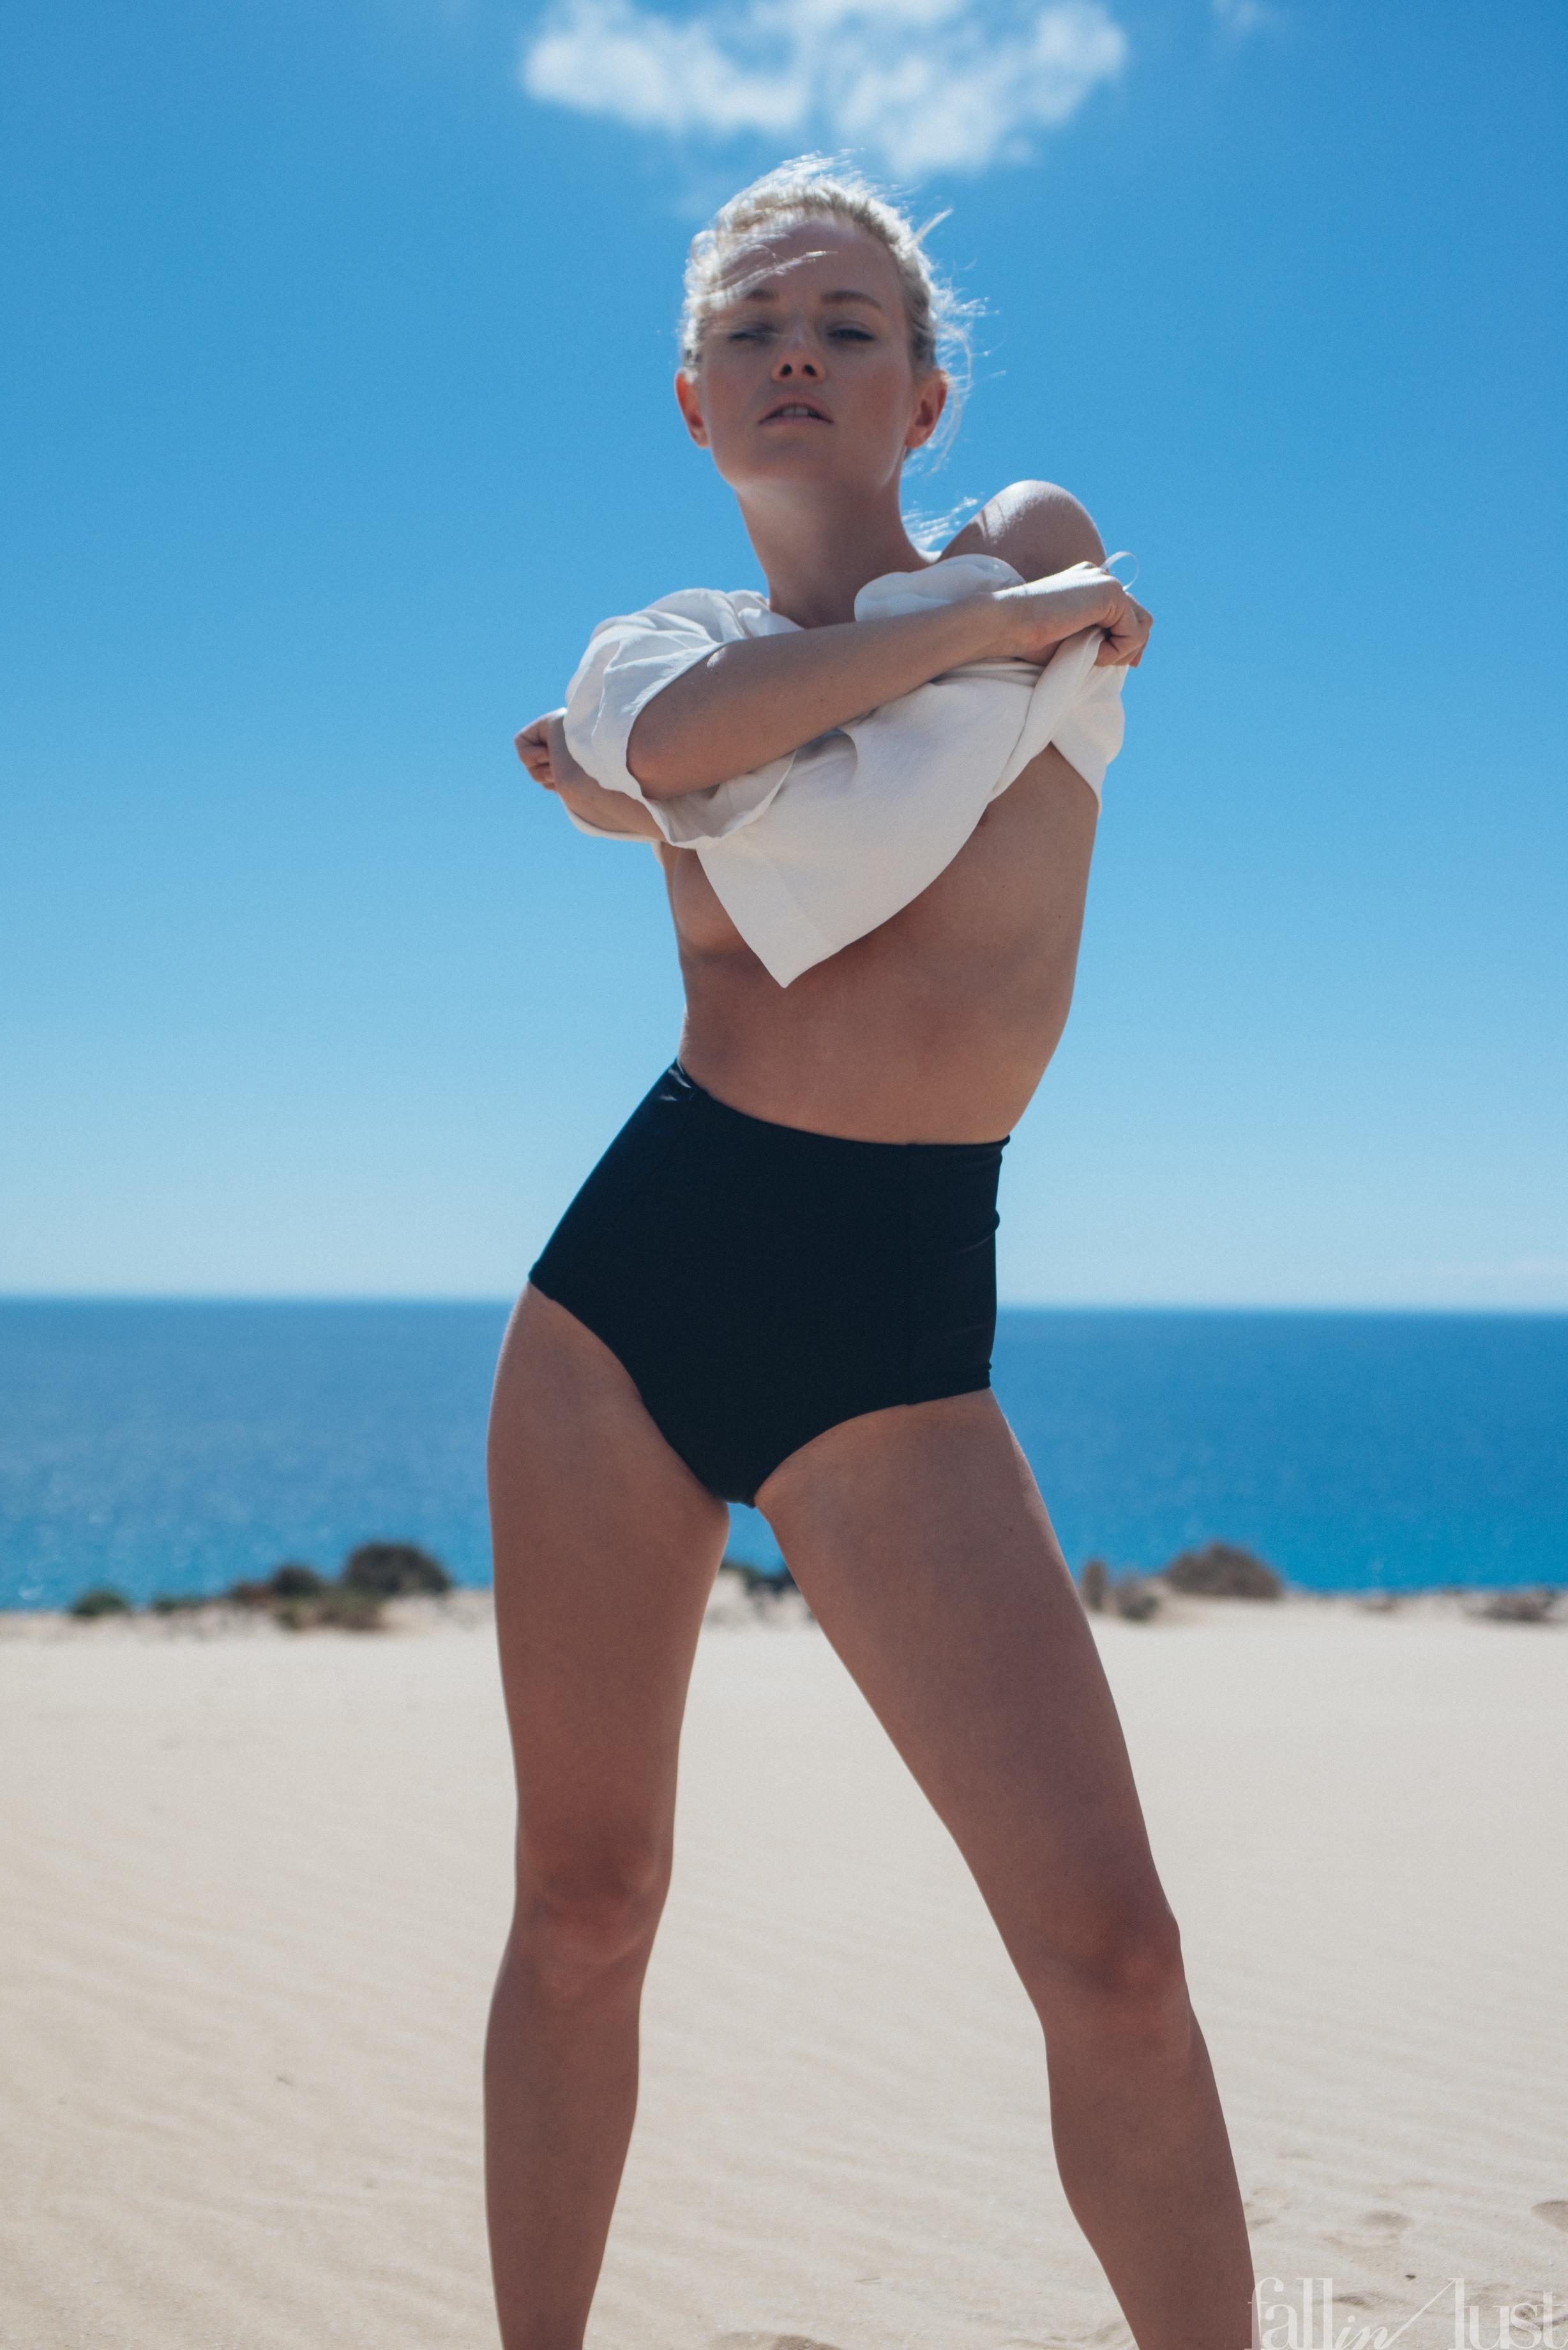 Красавица в трусиках показала сиськи на пляже - фото